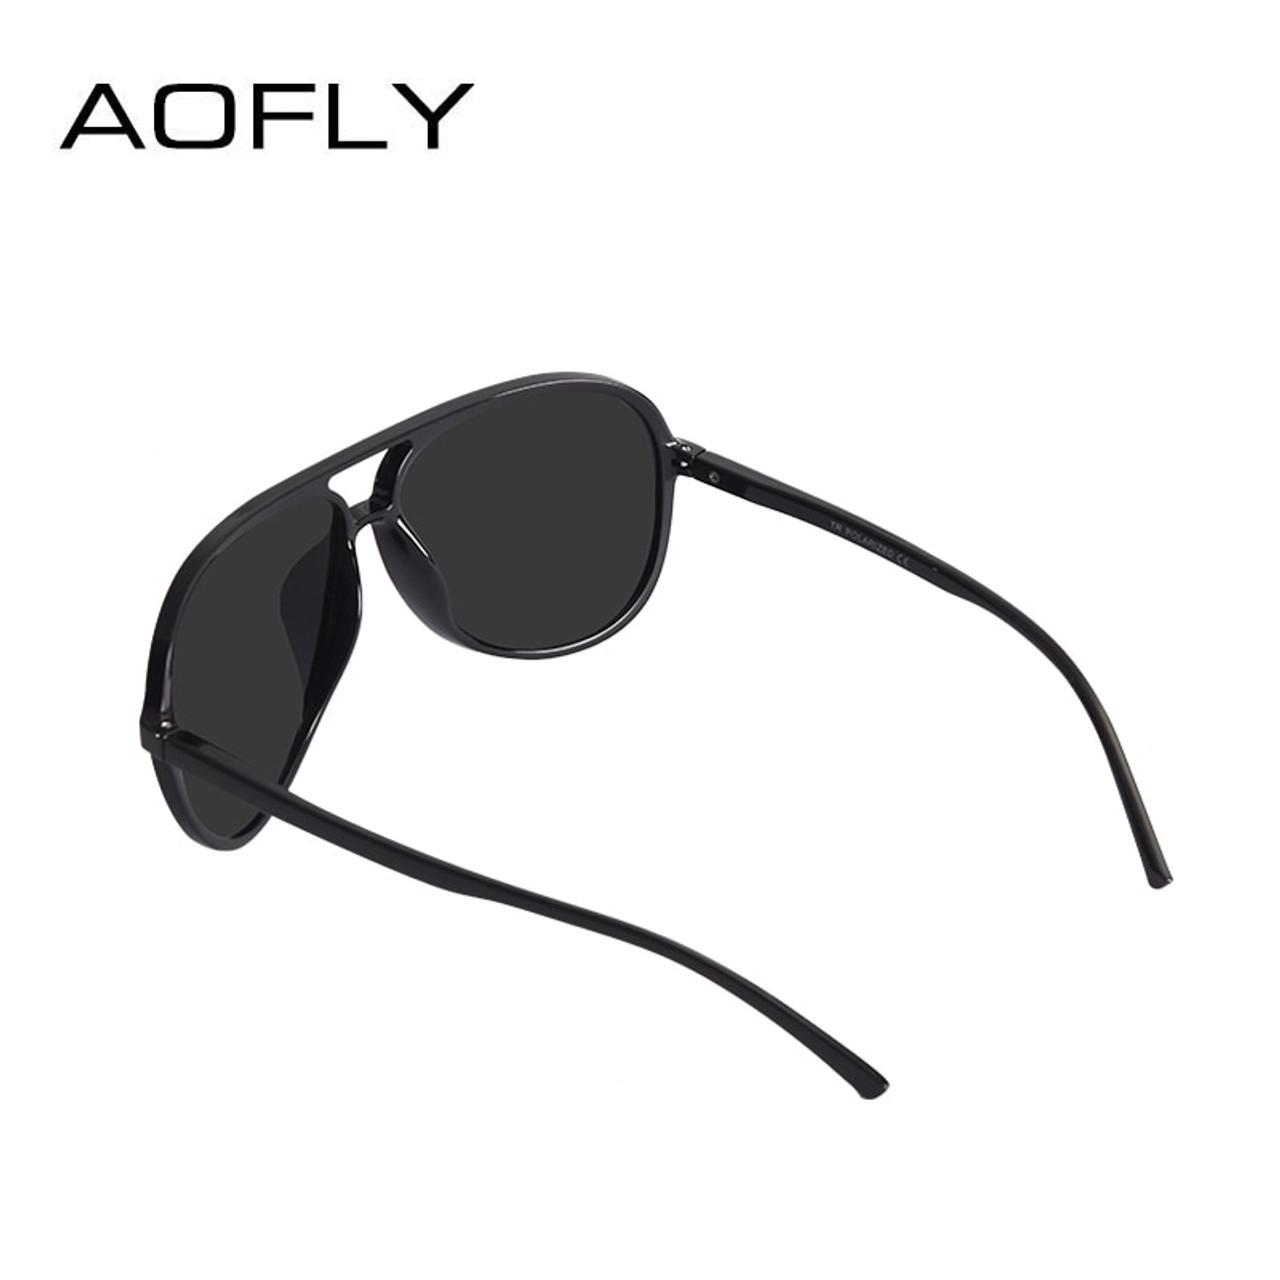 Pilot Sunglasses Ultralight TR90 Men Polarized Driving Sunglasses Sports Goggles